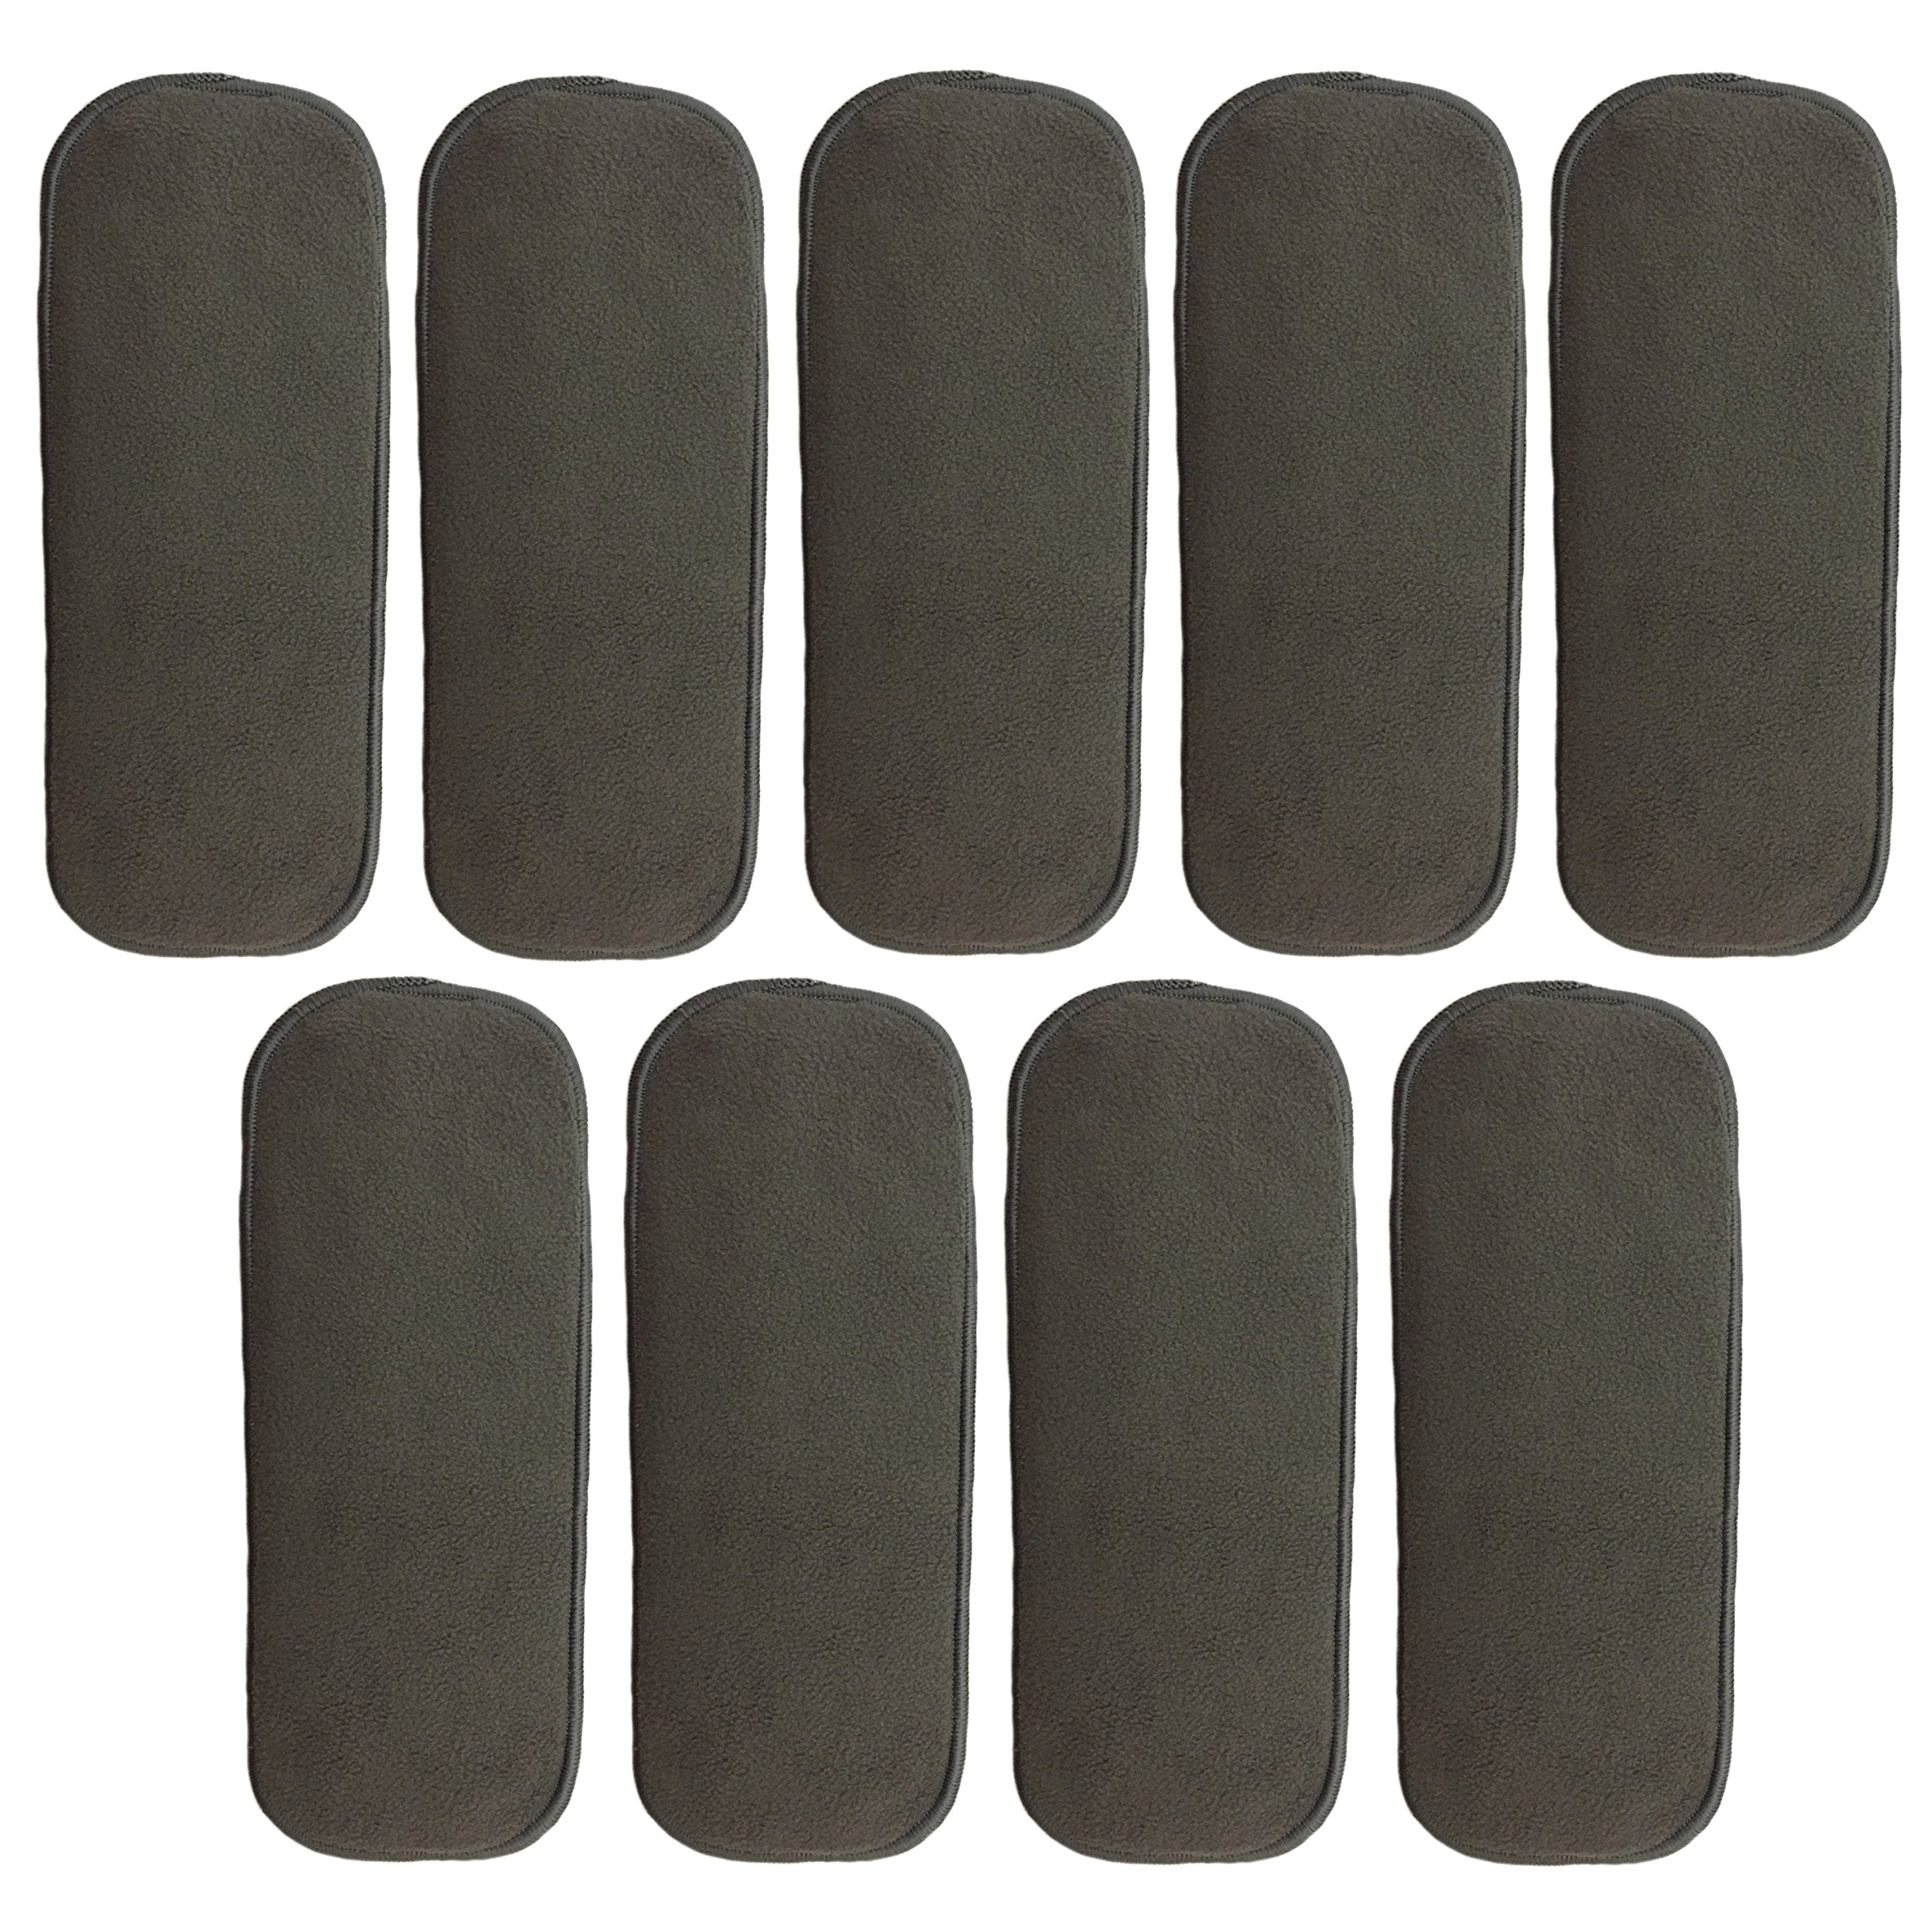 HappyEndings Newborn 5 Layer Charcoal Bamboo Inserts (Pack of 9)